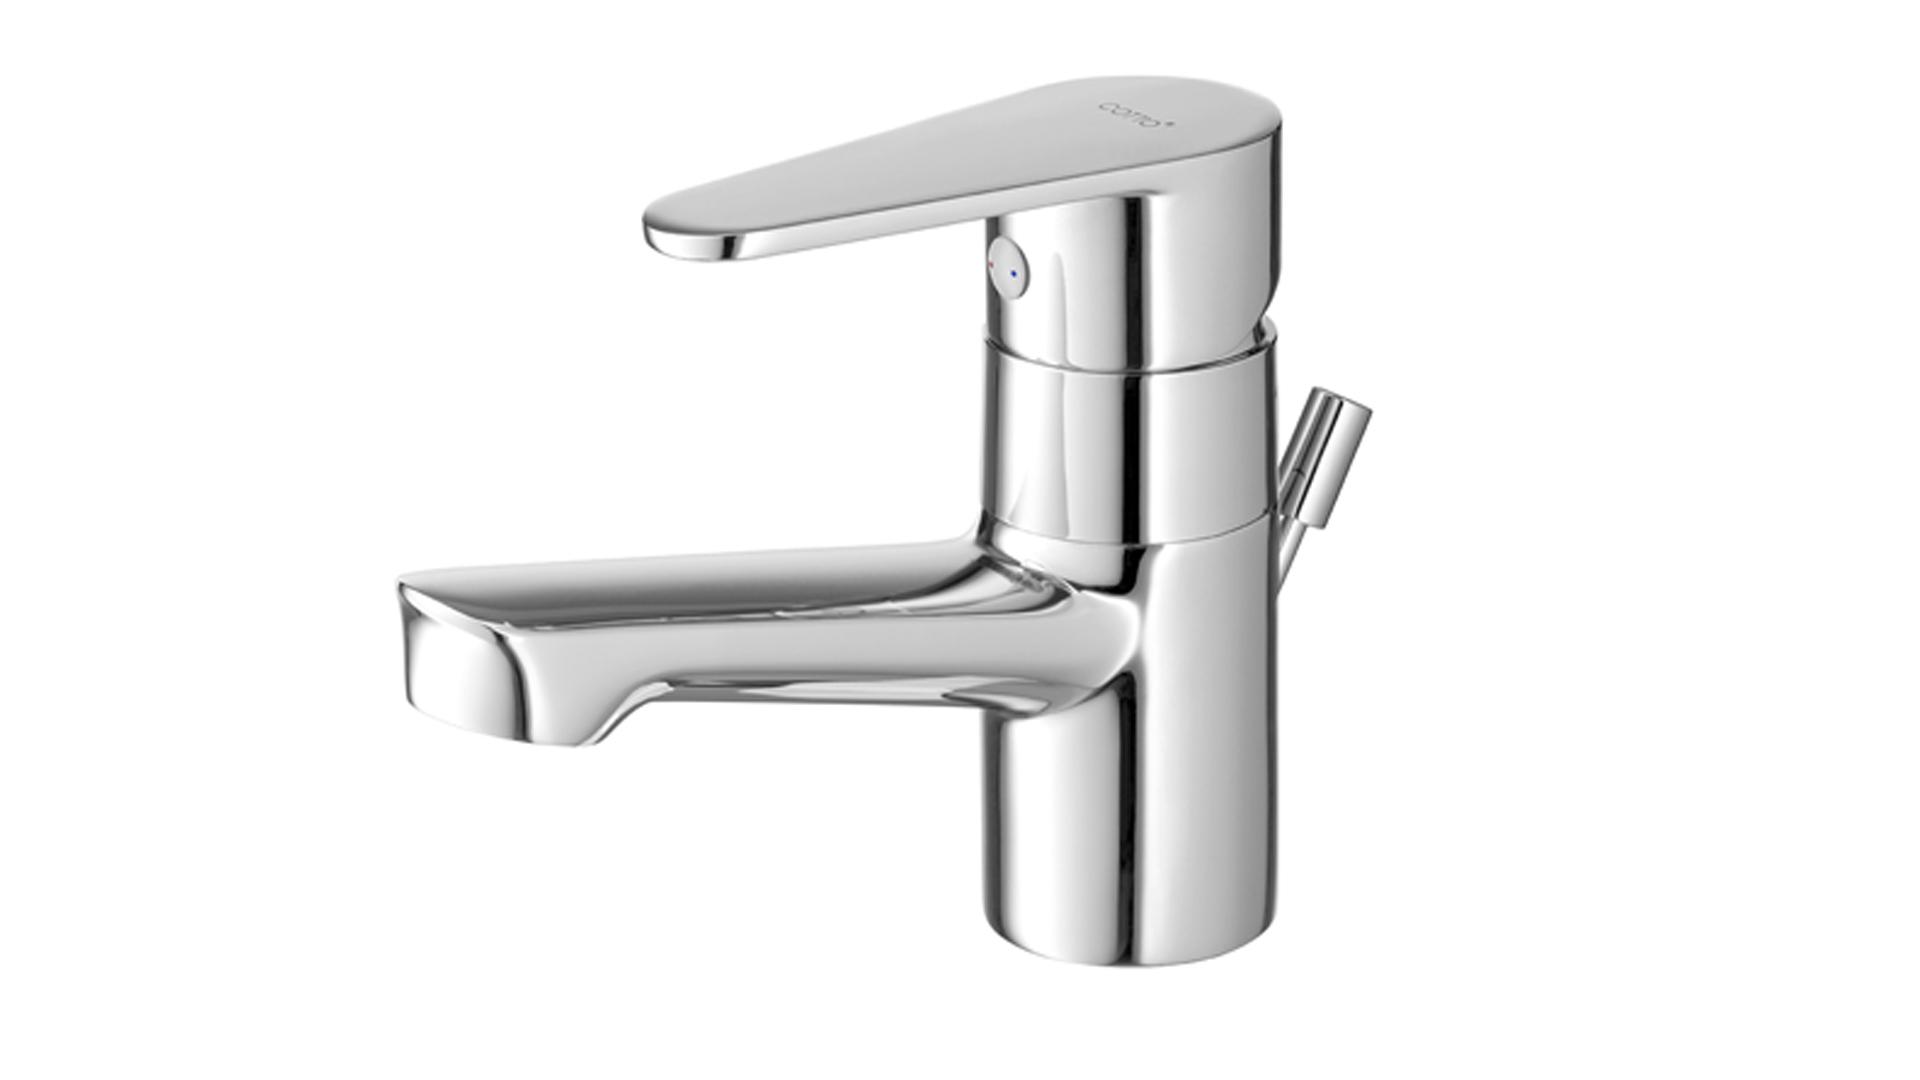 uno faucets hole waschtischarmatur hansa mix hansgrohe pret focus faucet ecosmart single gelb